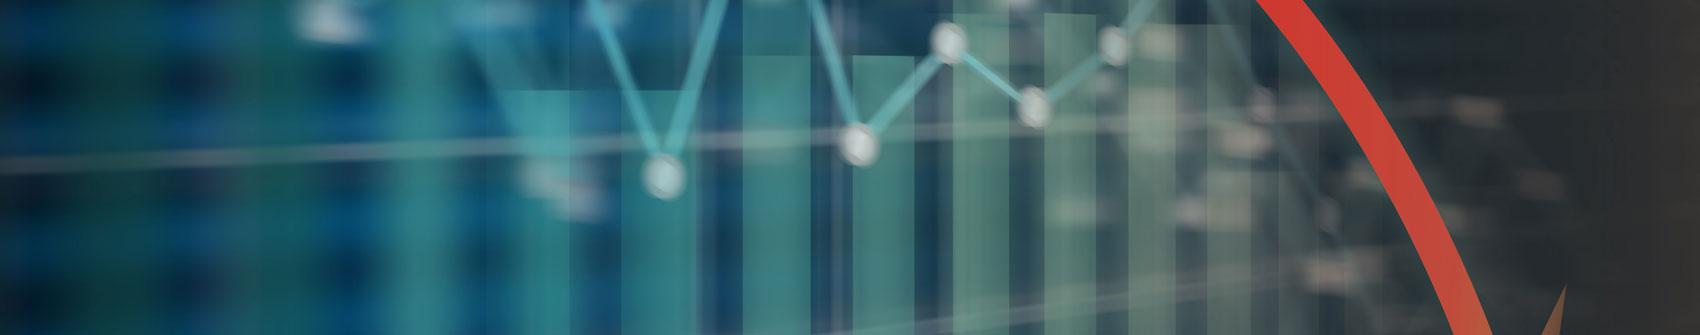 When Do Slowdowns Turn Into Recessions?